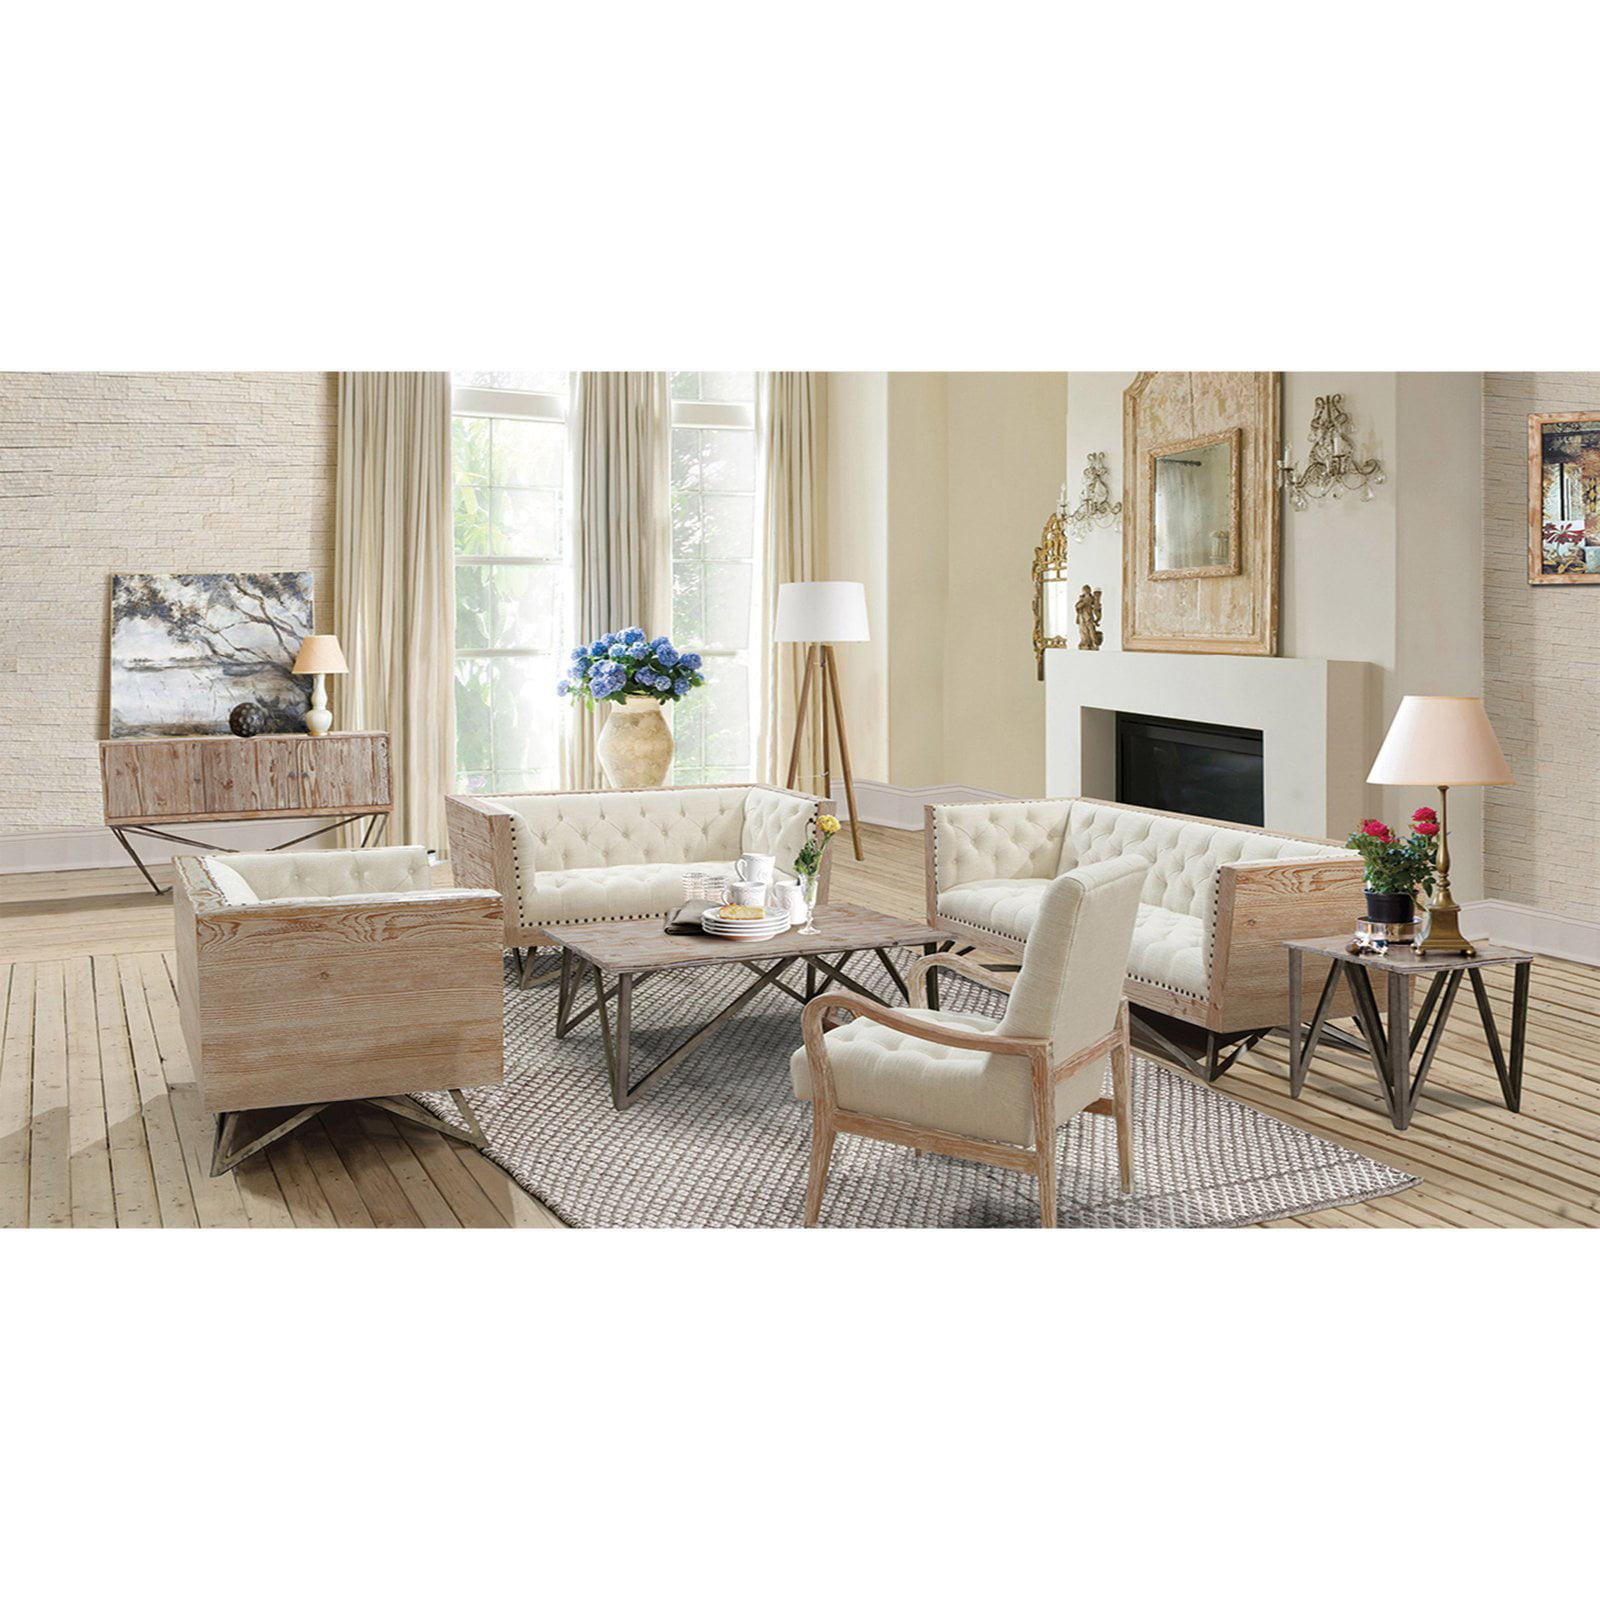 Armen Living Regis Cream Sofa with Pine Frame and Gunmetal Legs